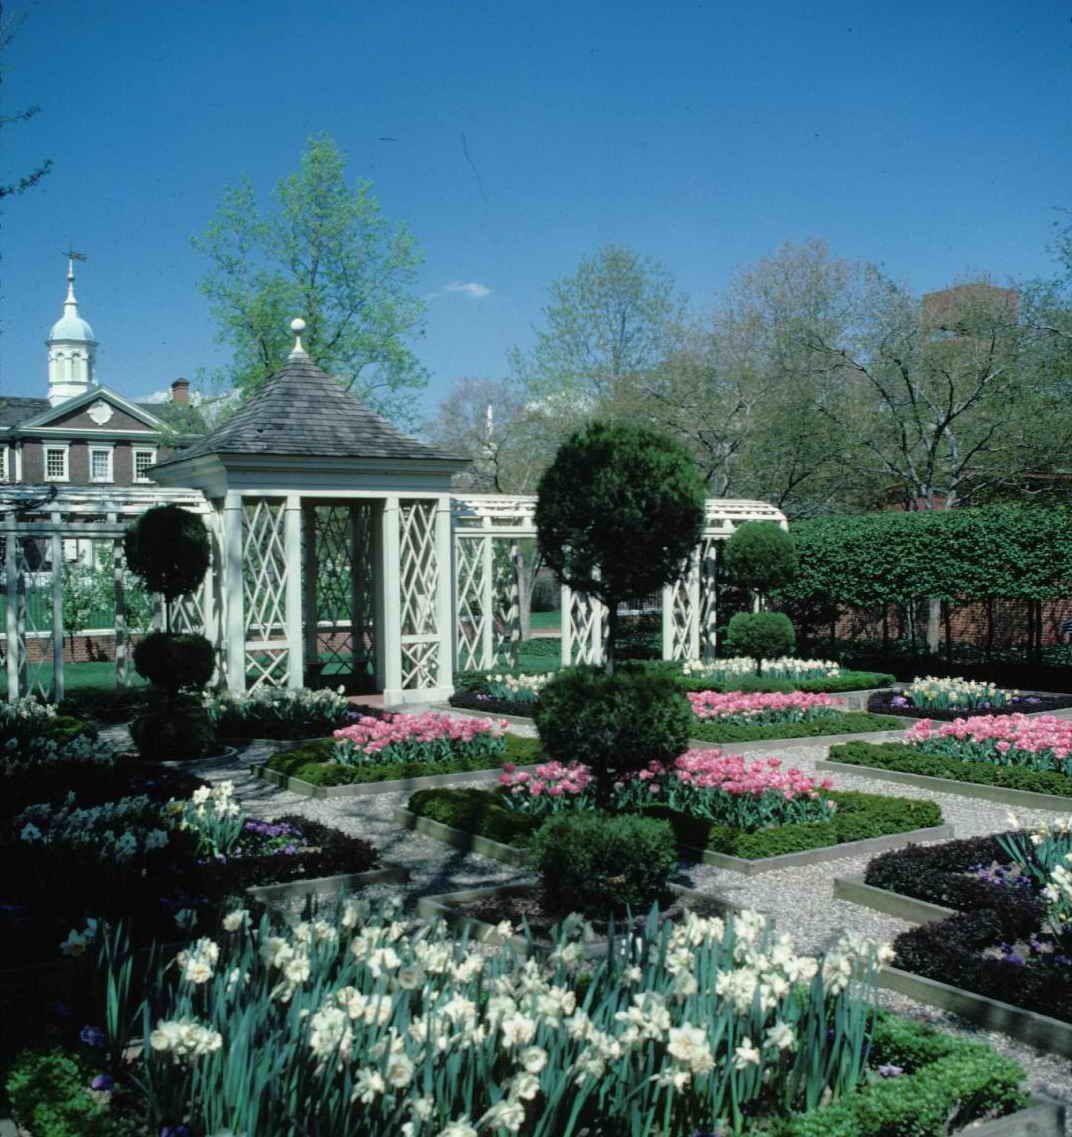 18th Century Garden Garden history, Garden, 18th century